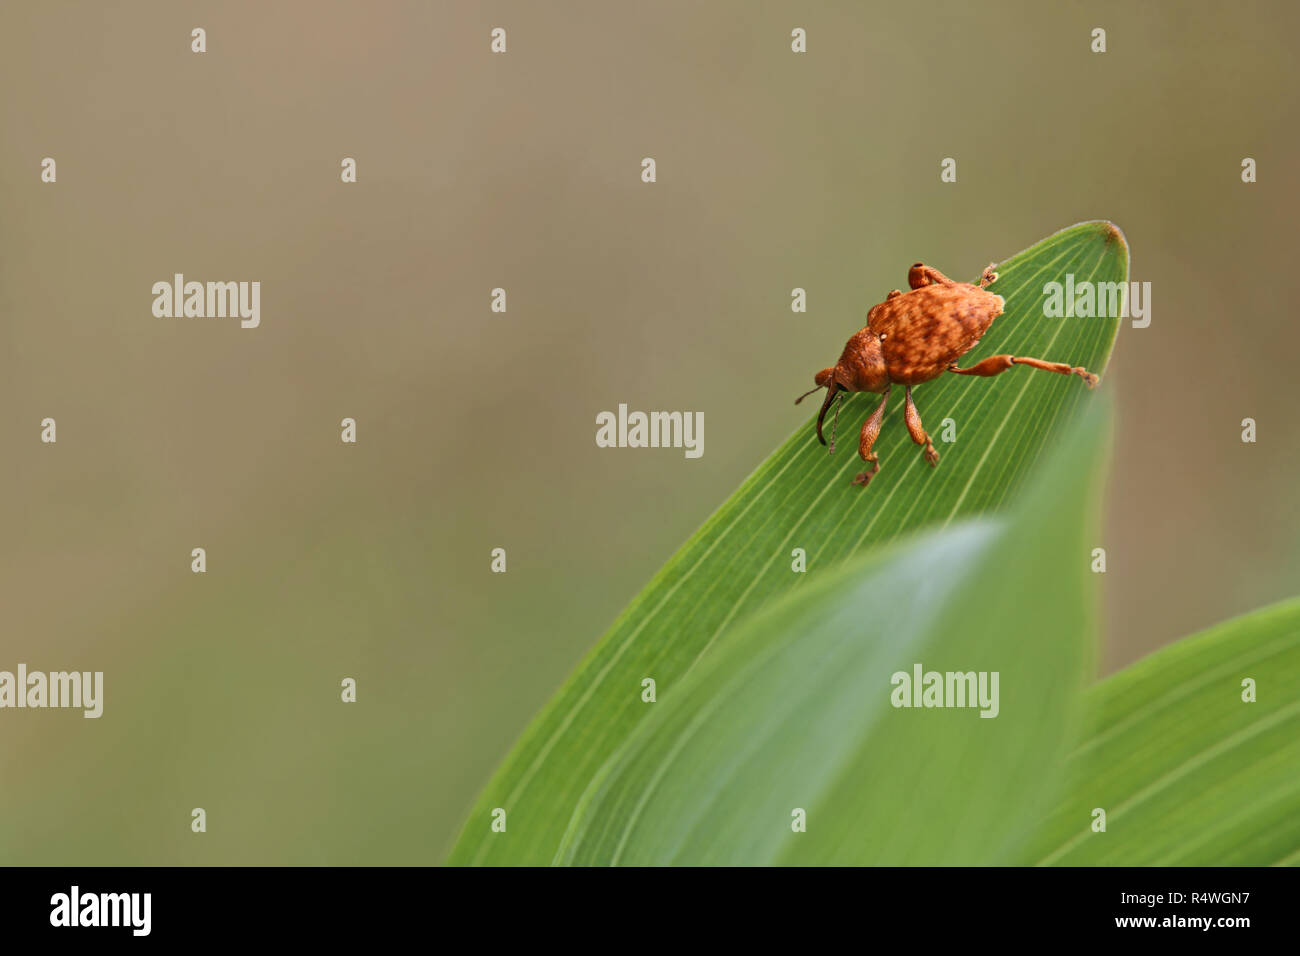 Rüsselkäfer curculio auf Salomon Dichtung Stockbild